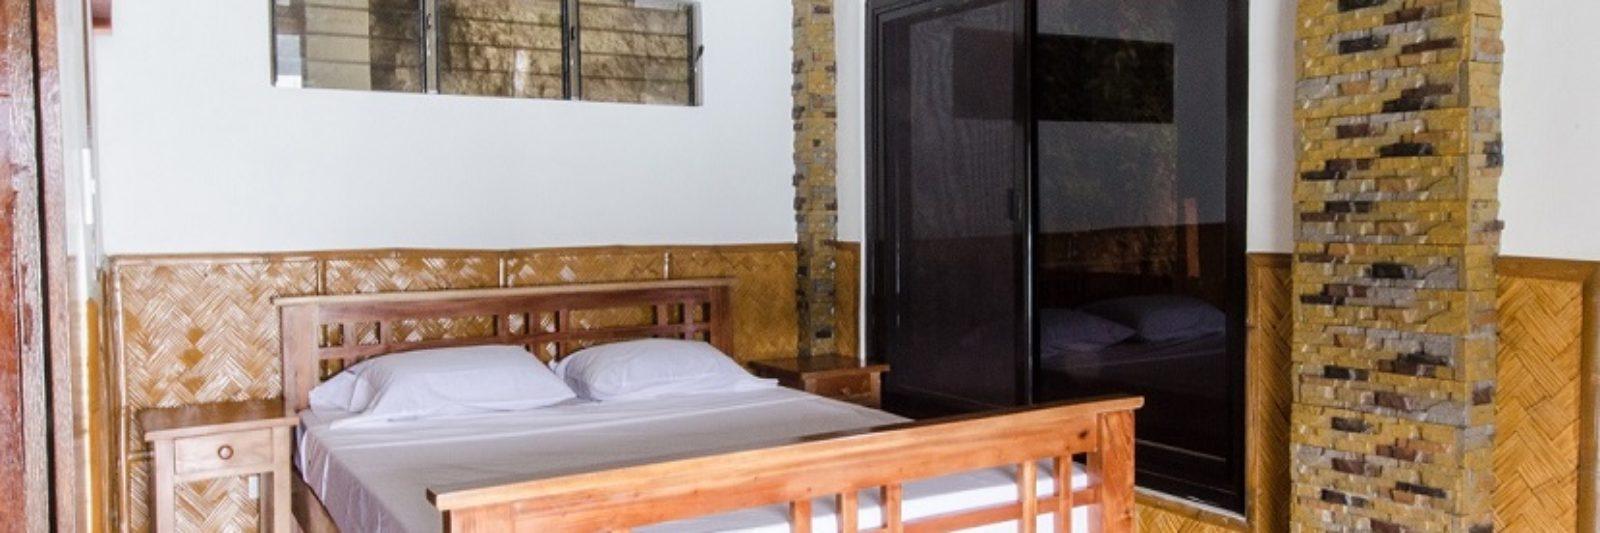 Bed Sitter Room Fan Villa De Pico